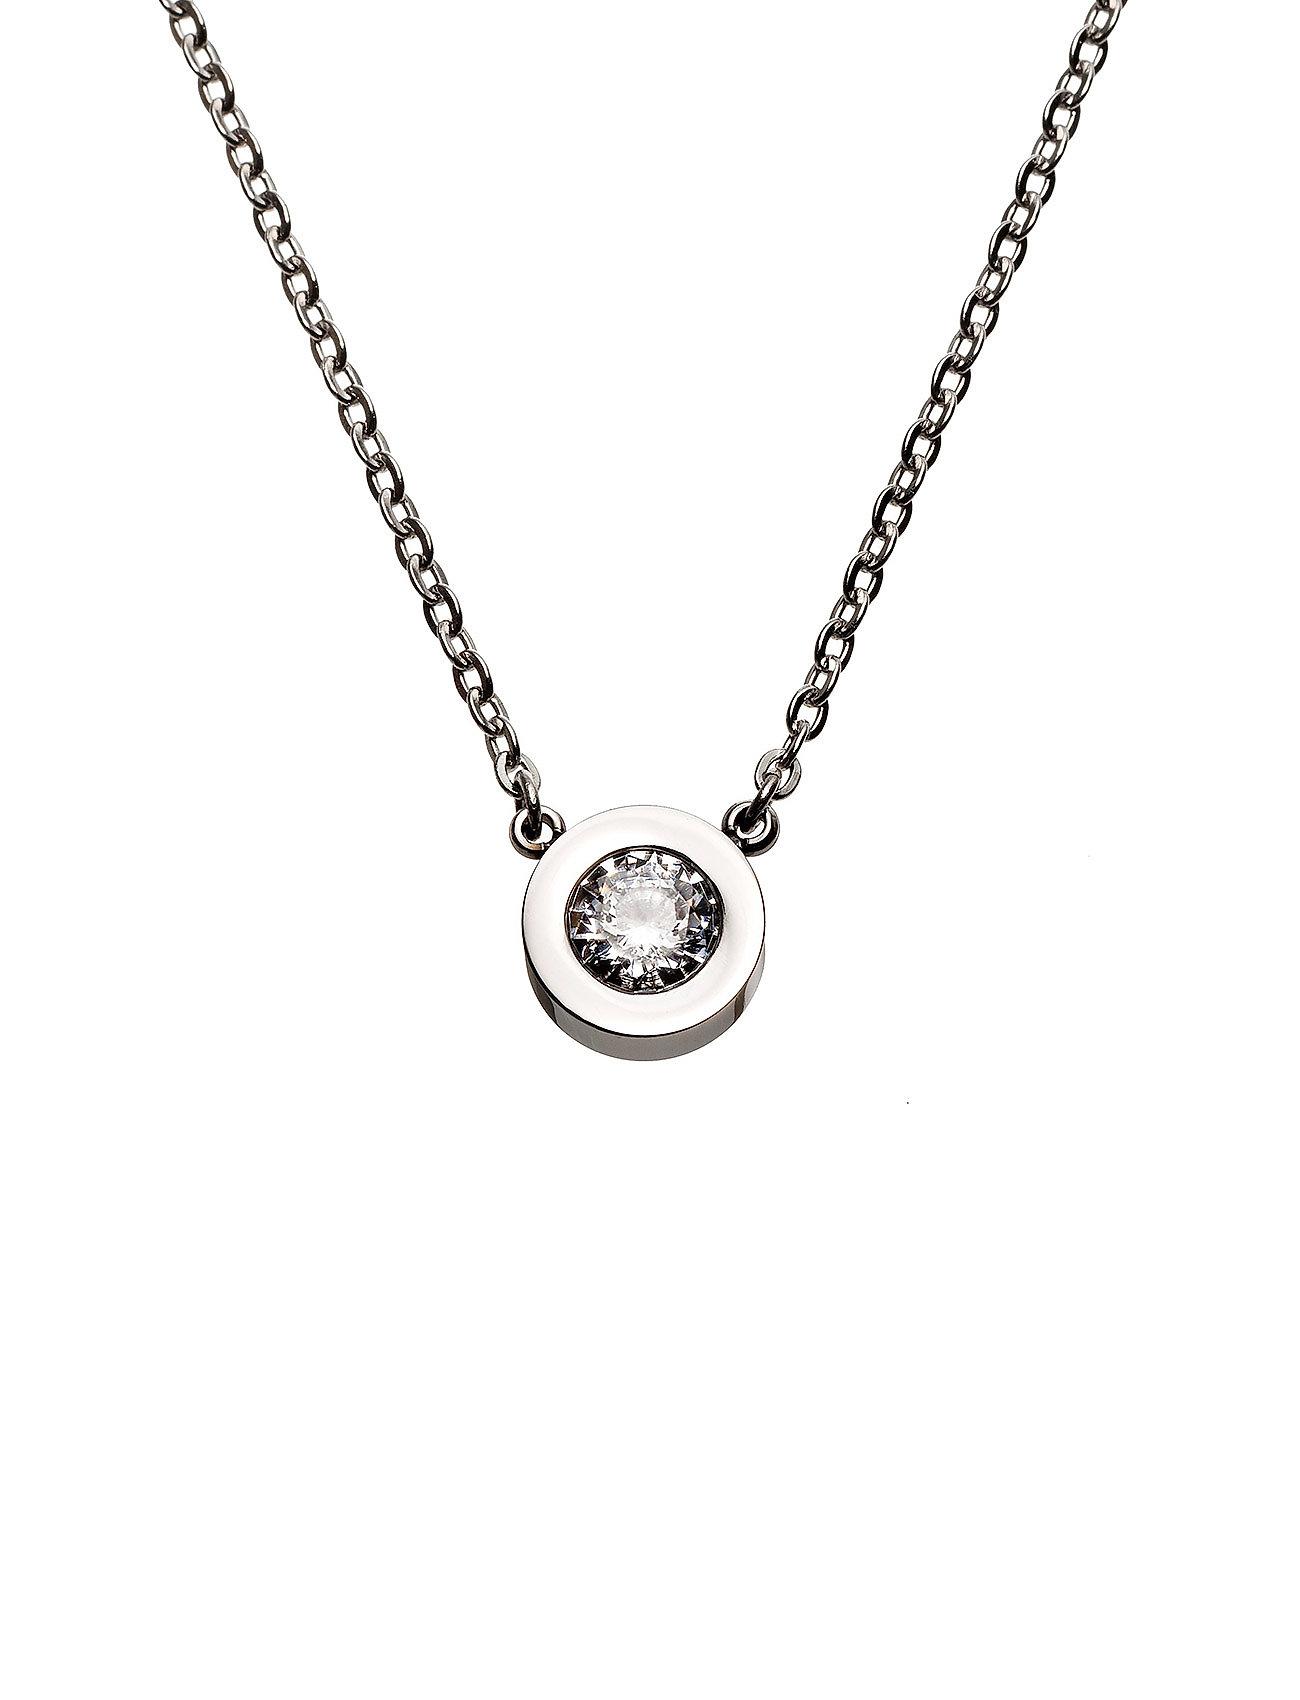 Edblad Stella Necklace Accessories Jewellery Necklaces Dainty Necklaces Hopea Edblad